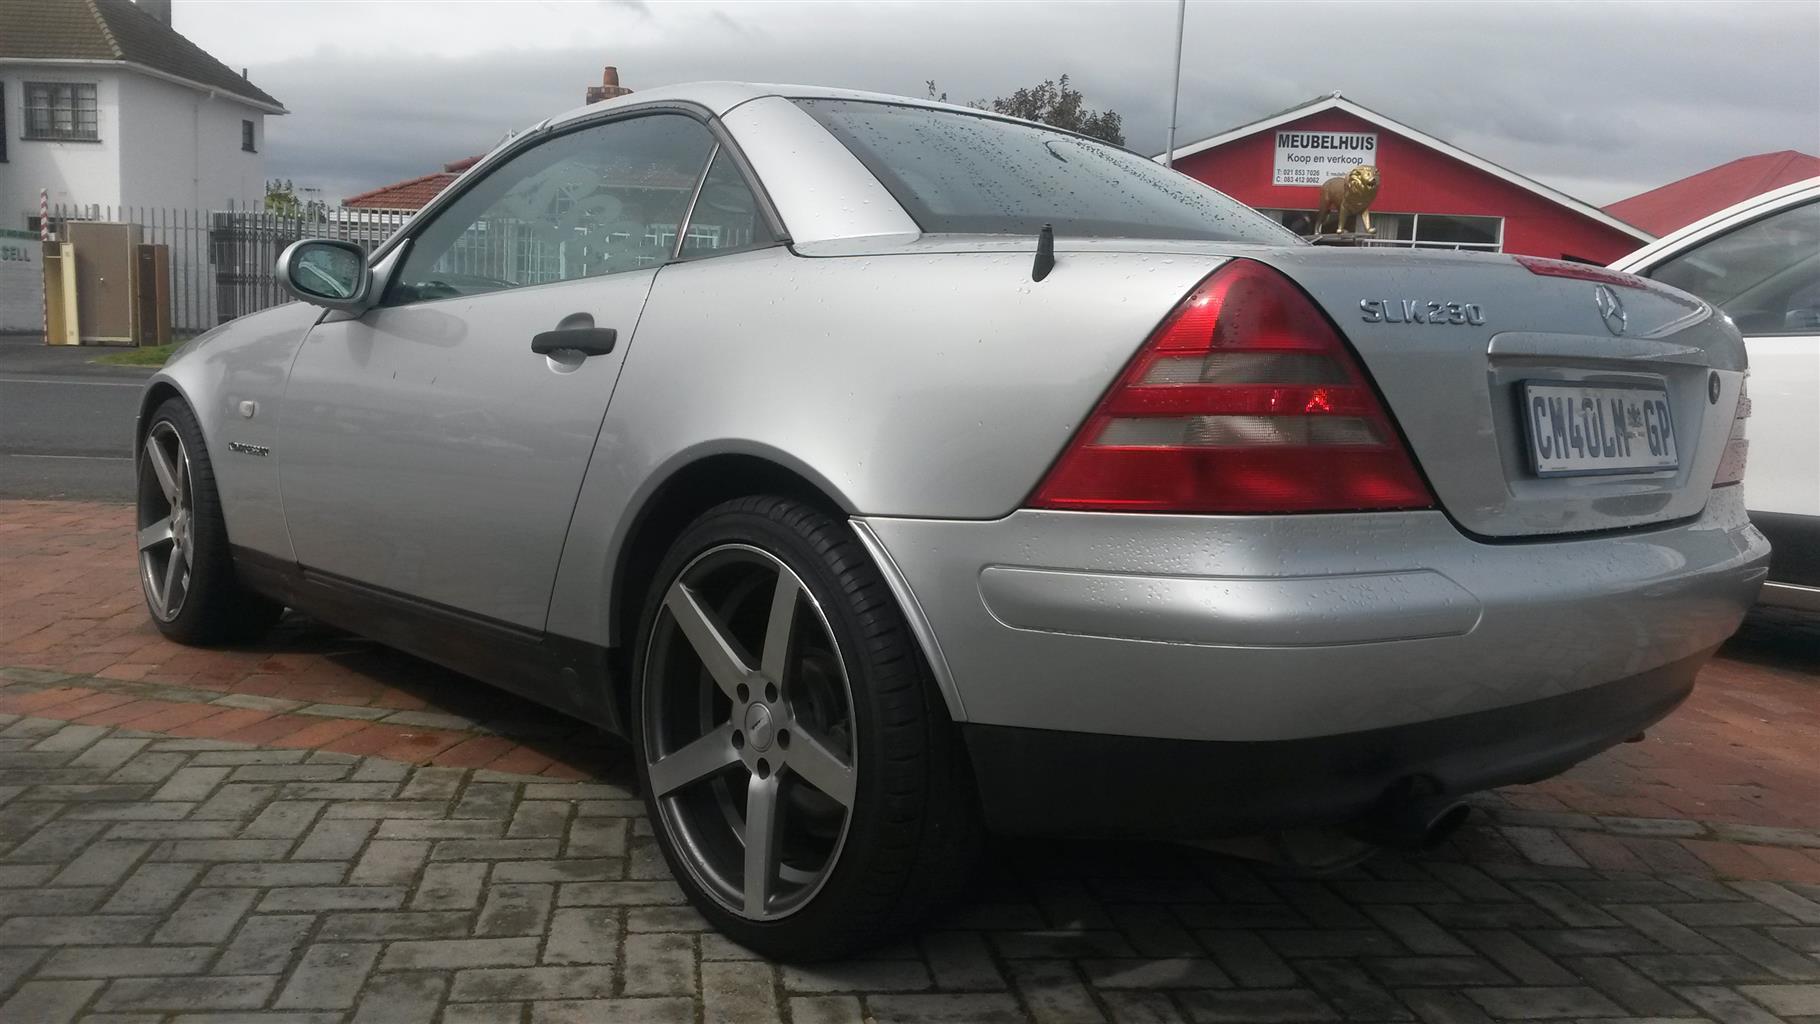 2002 Mercedes Benz 180B